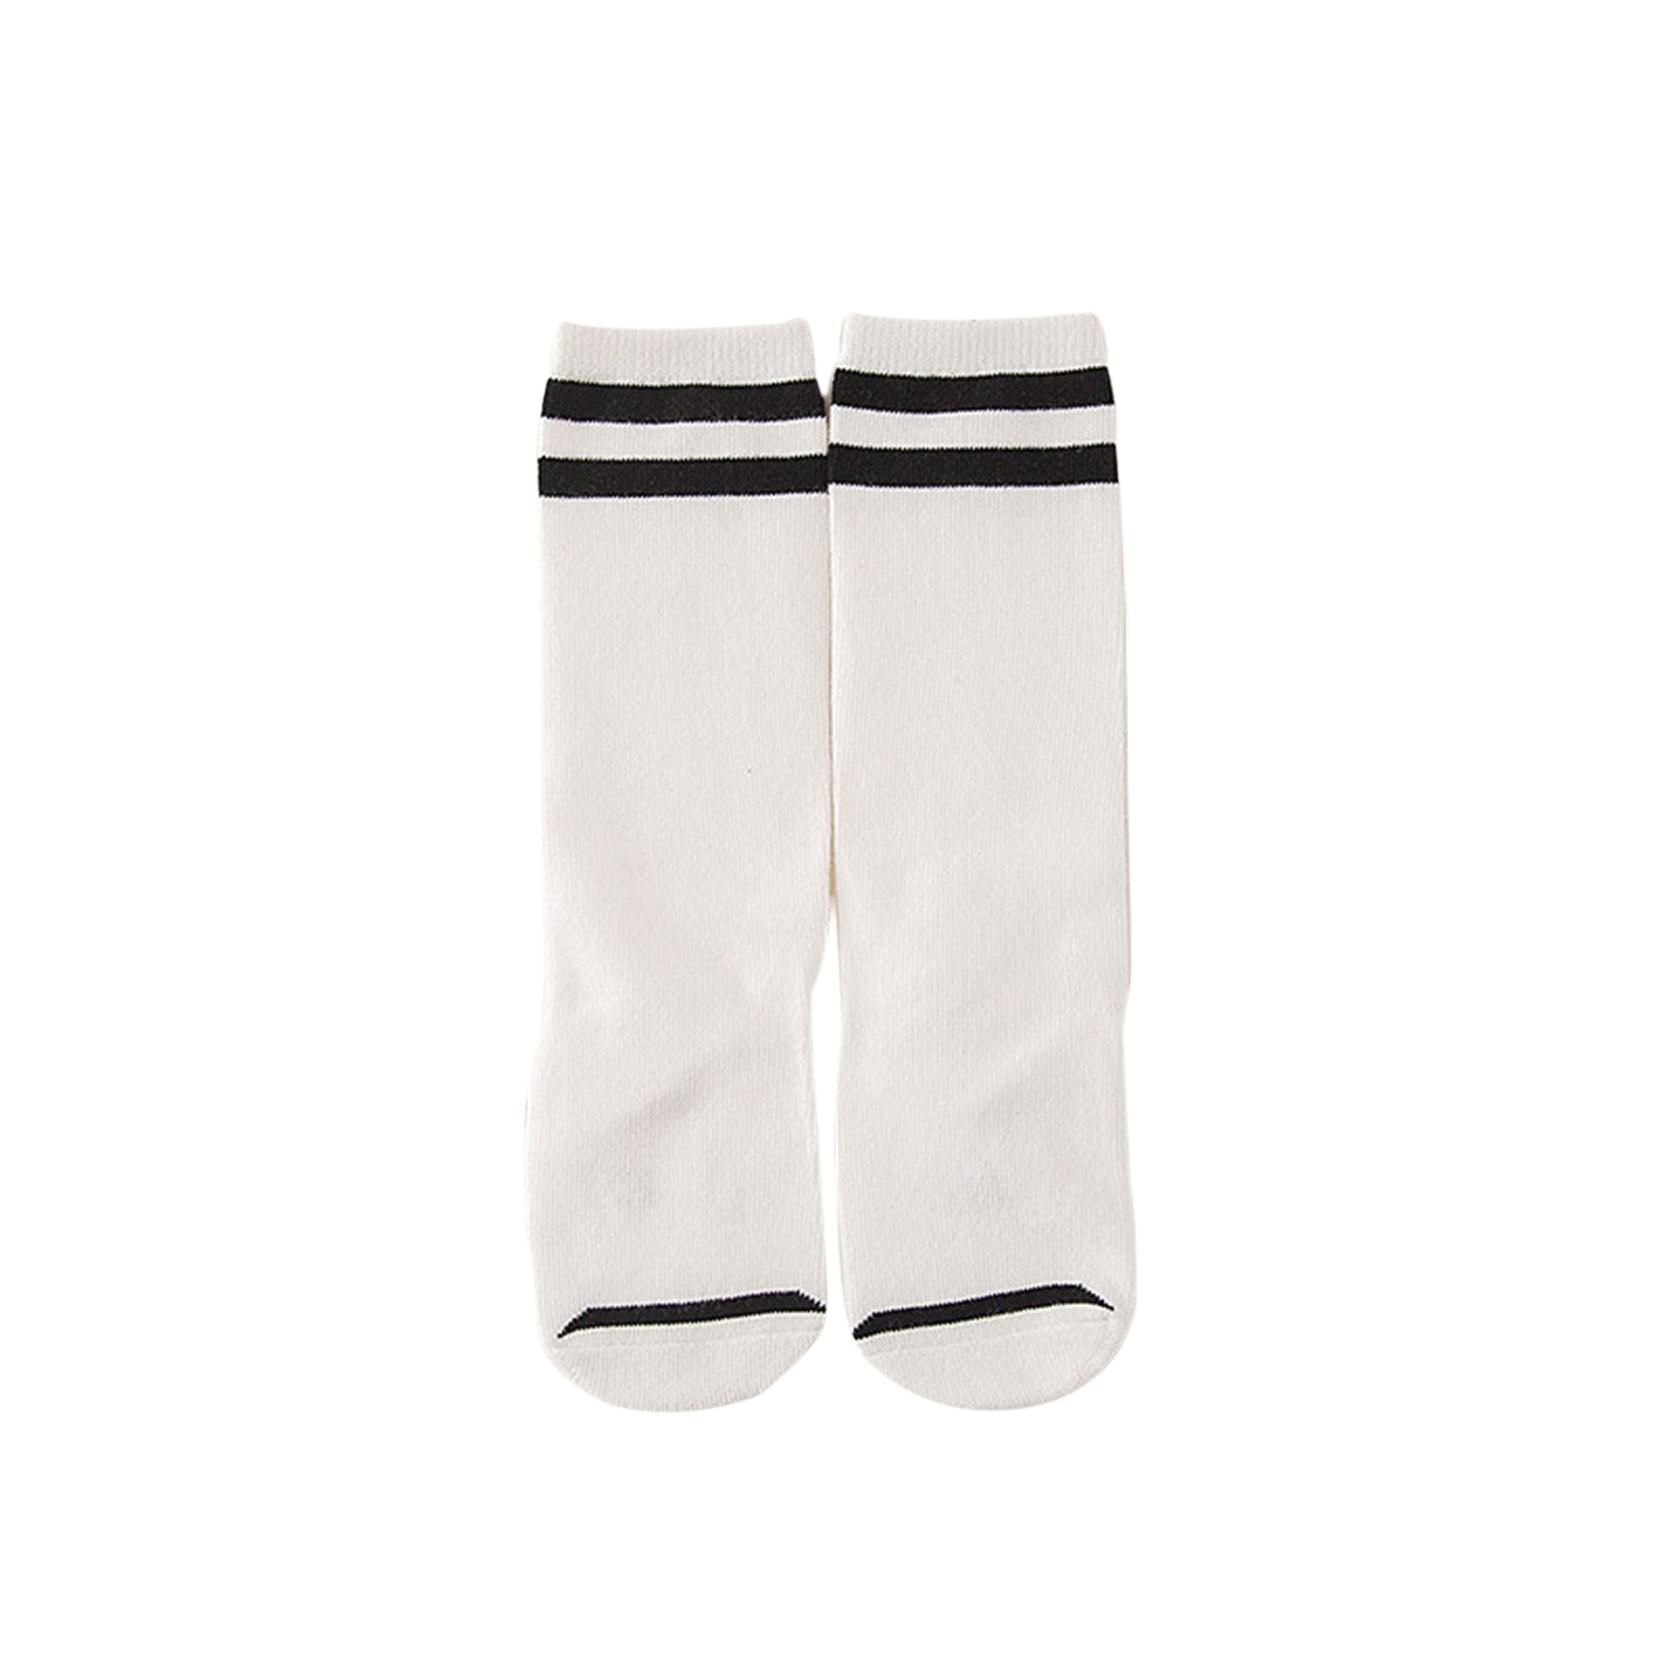 Striped Cotton Sport Kids Socks For Baby Girls Boys School Knee High Socks Leg Warmers Toddler 0-3 Years Clothing Accessories